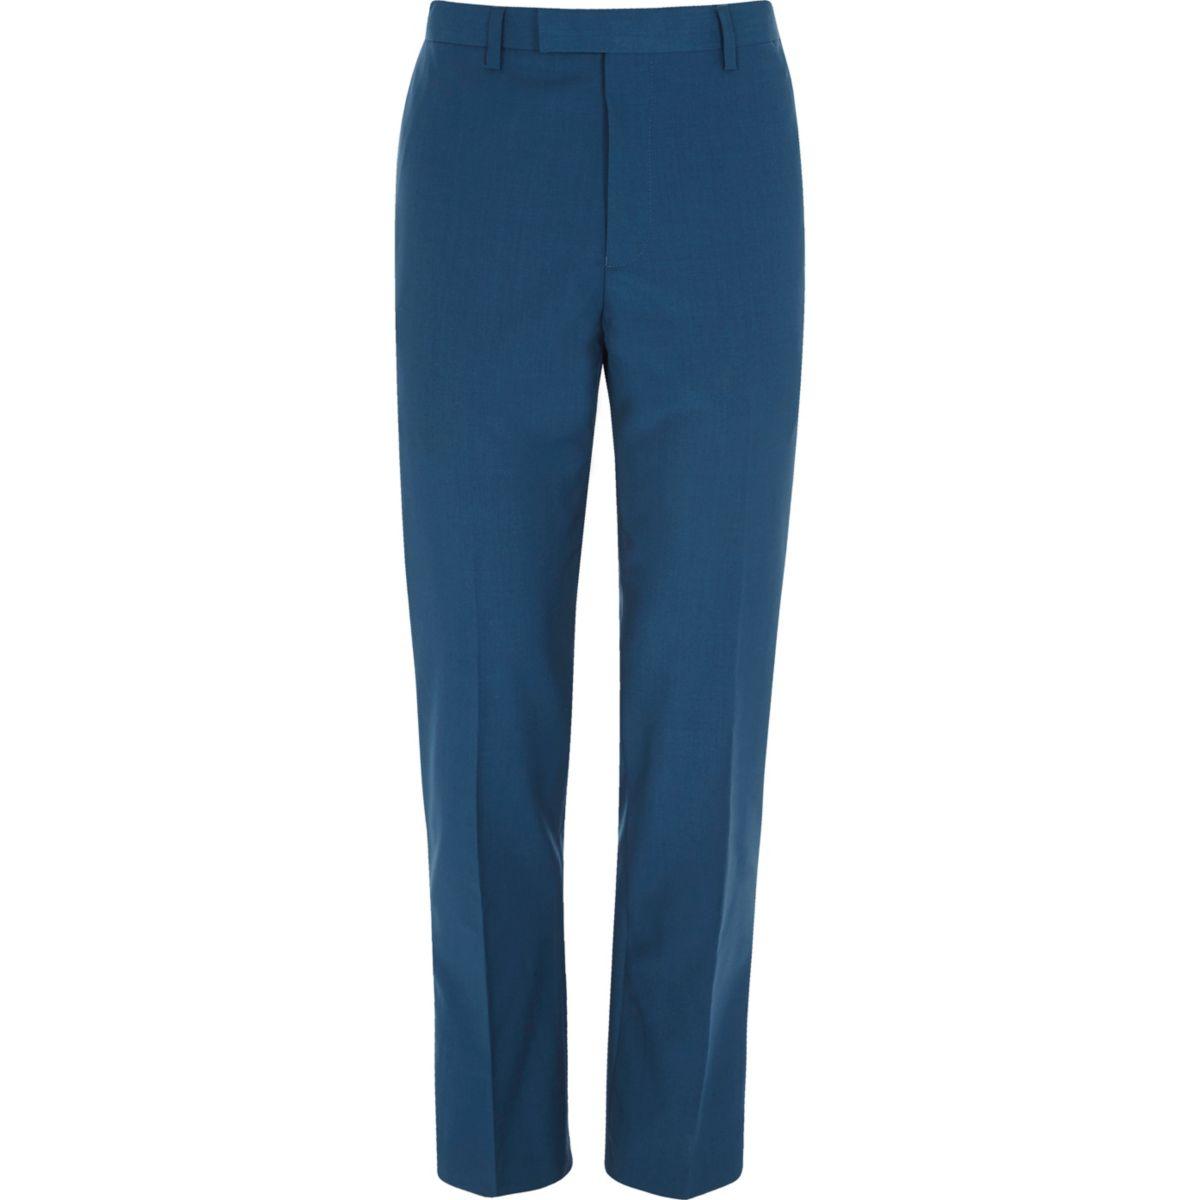 Blaue Anzughose in Slim Fit